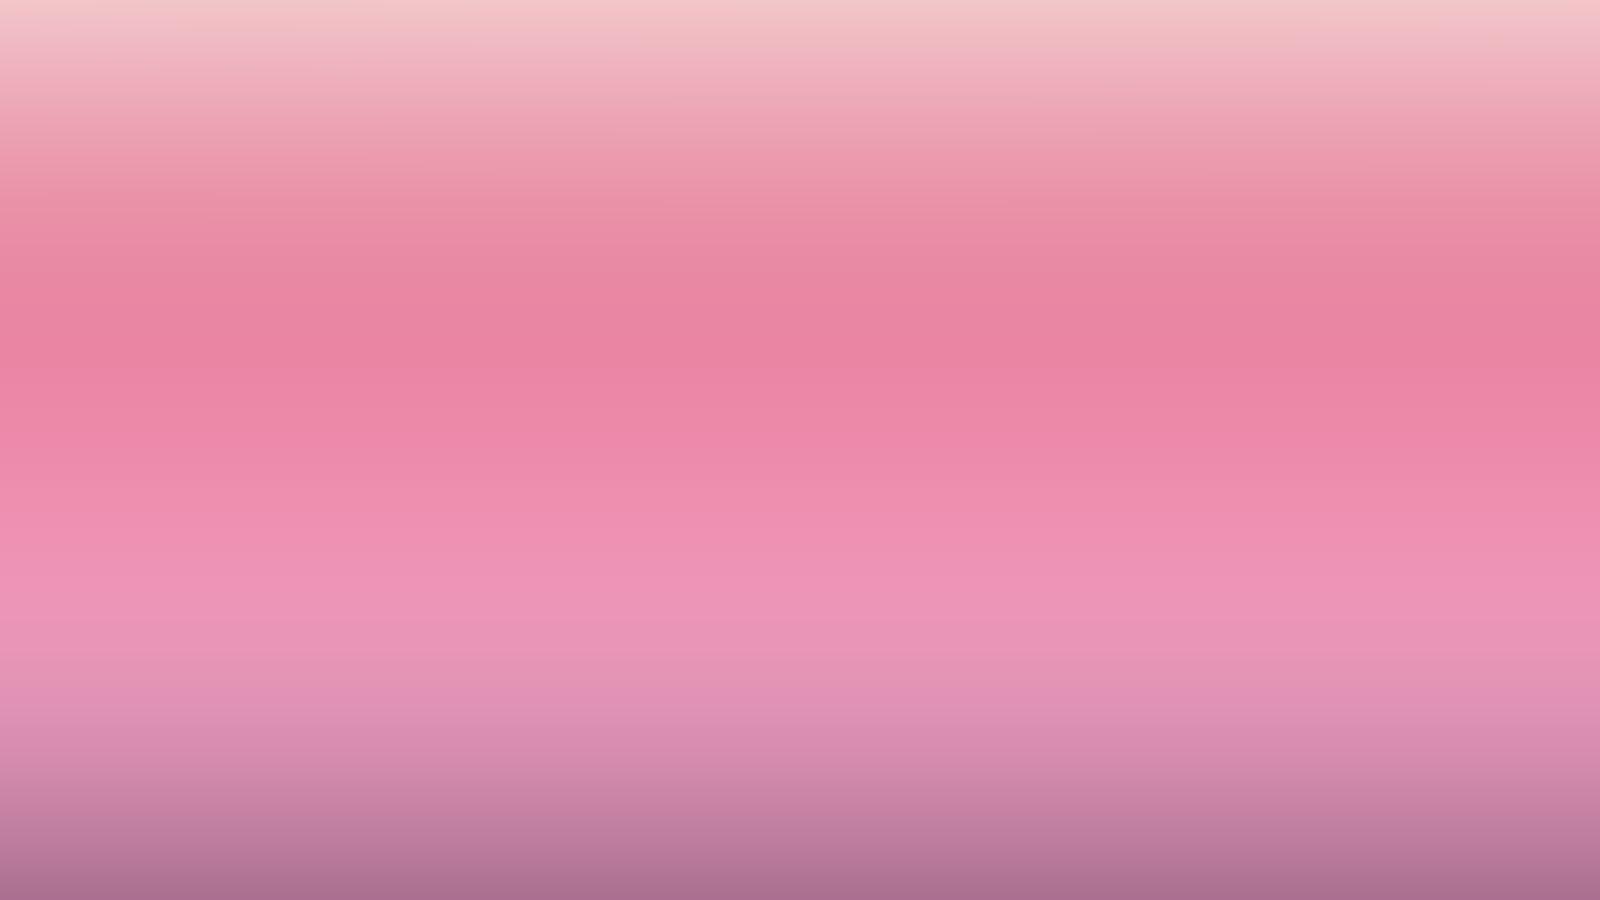 wallpaper for desktop, laptop | sj35-purple-pink-soft ...